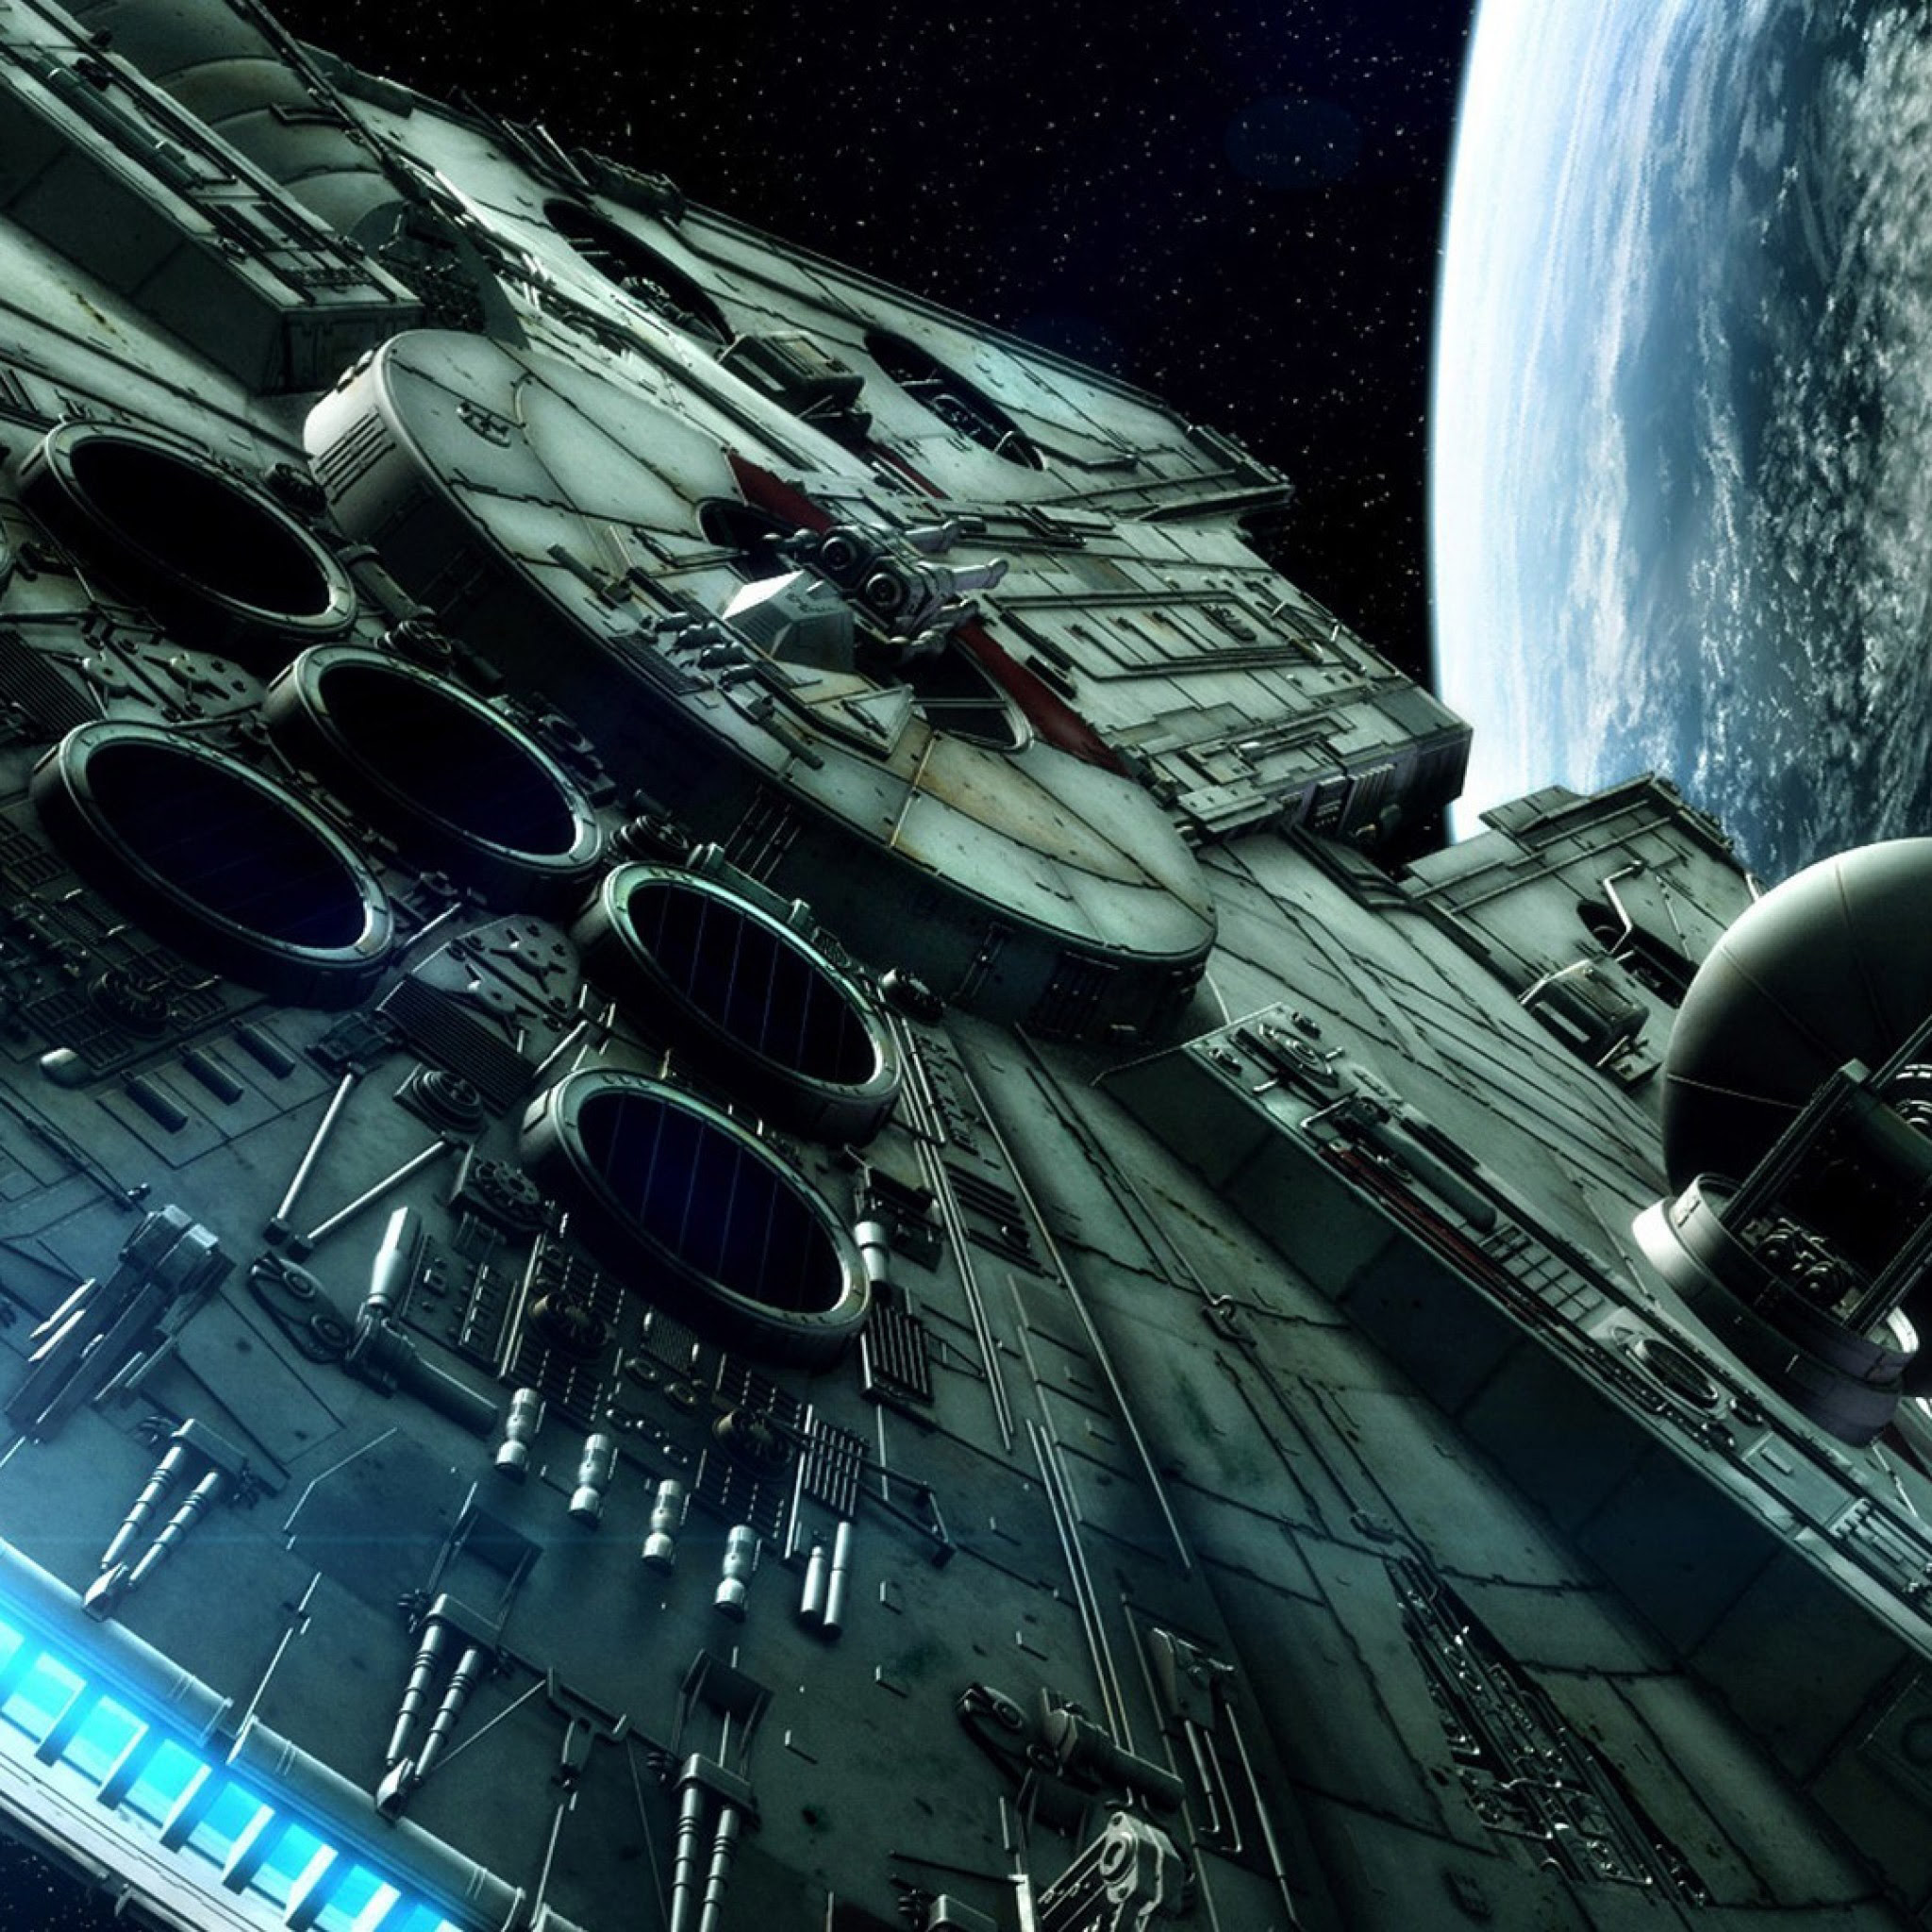 Star Wars Ipad Pro Wallpaper 4k Get Images